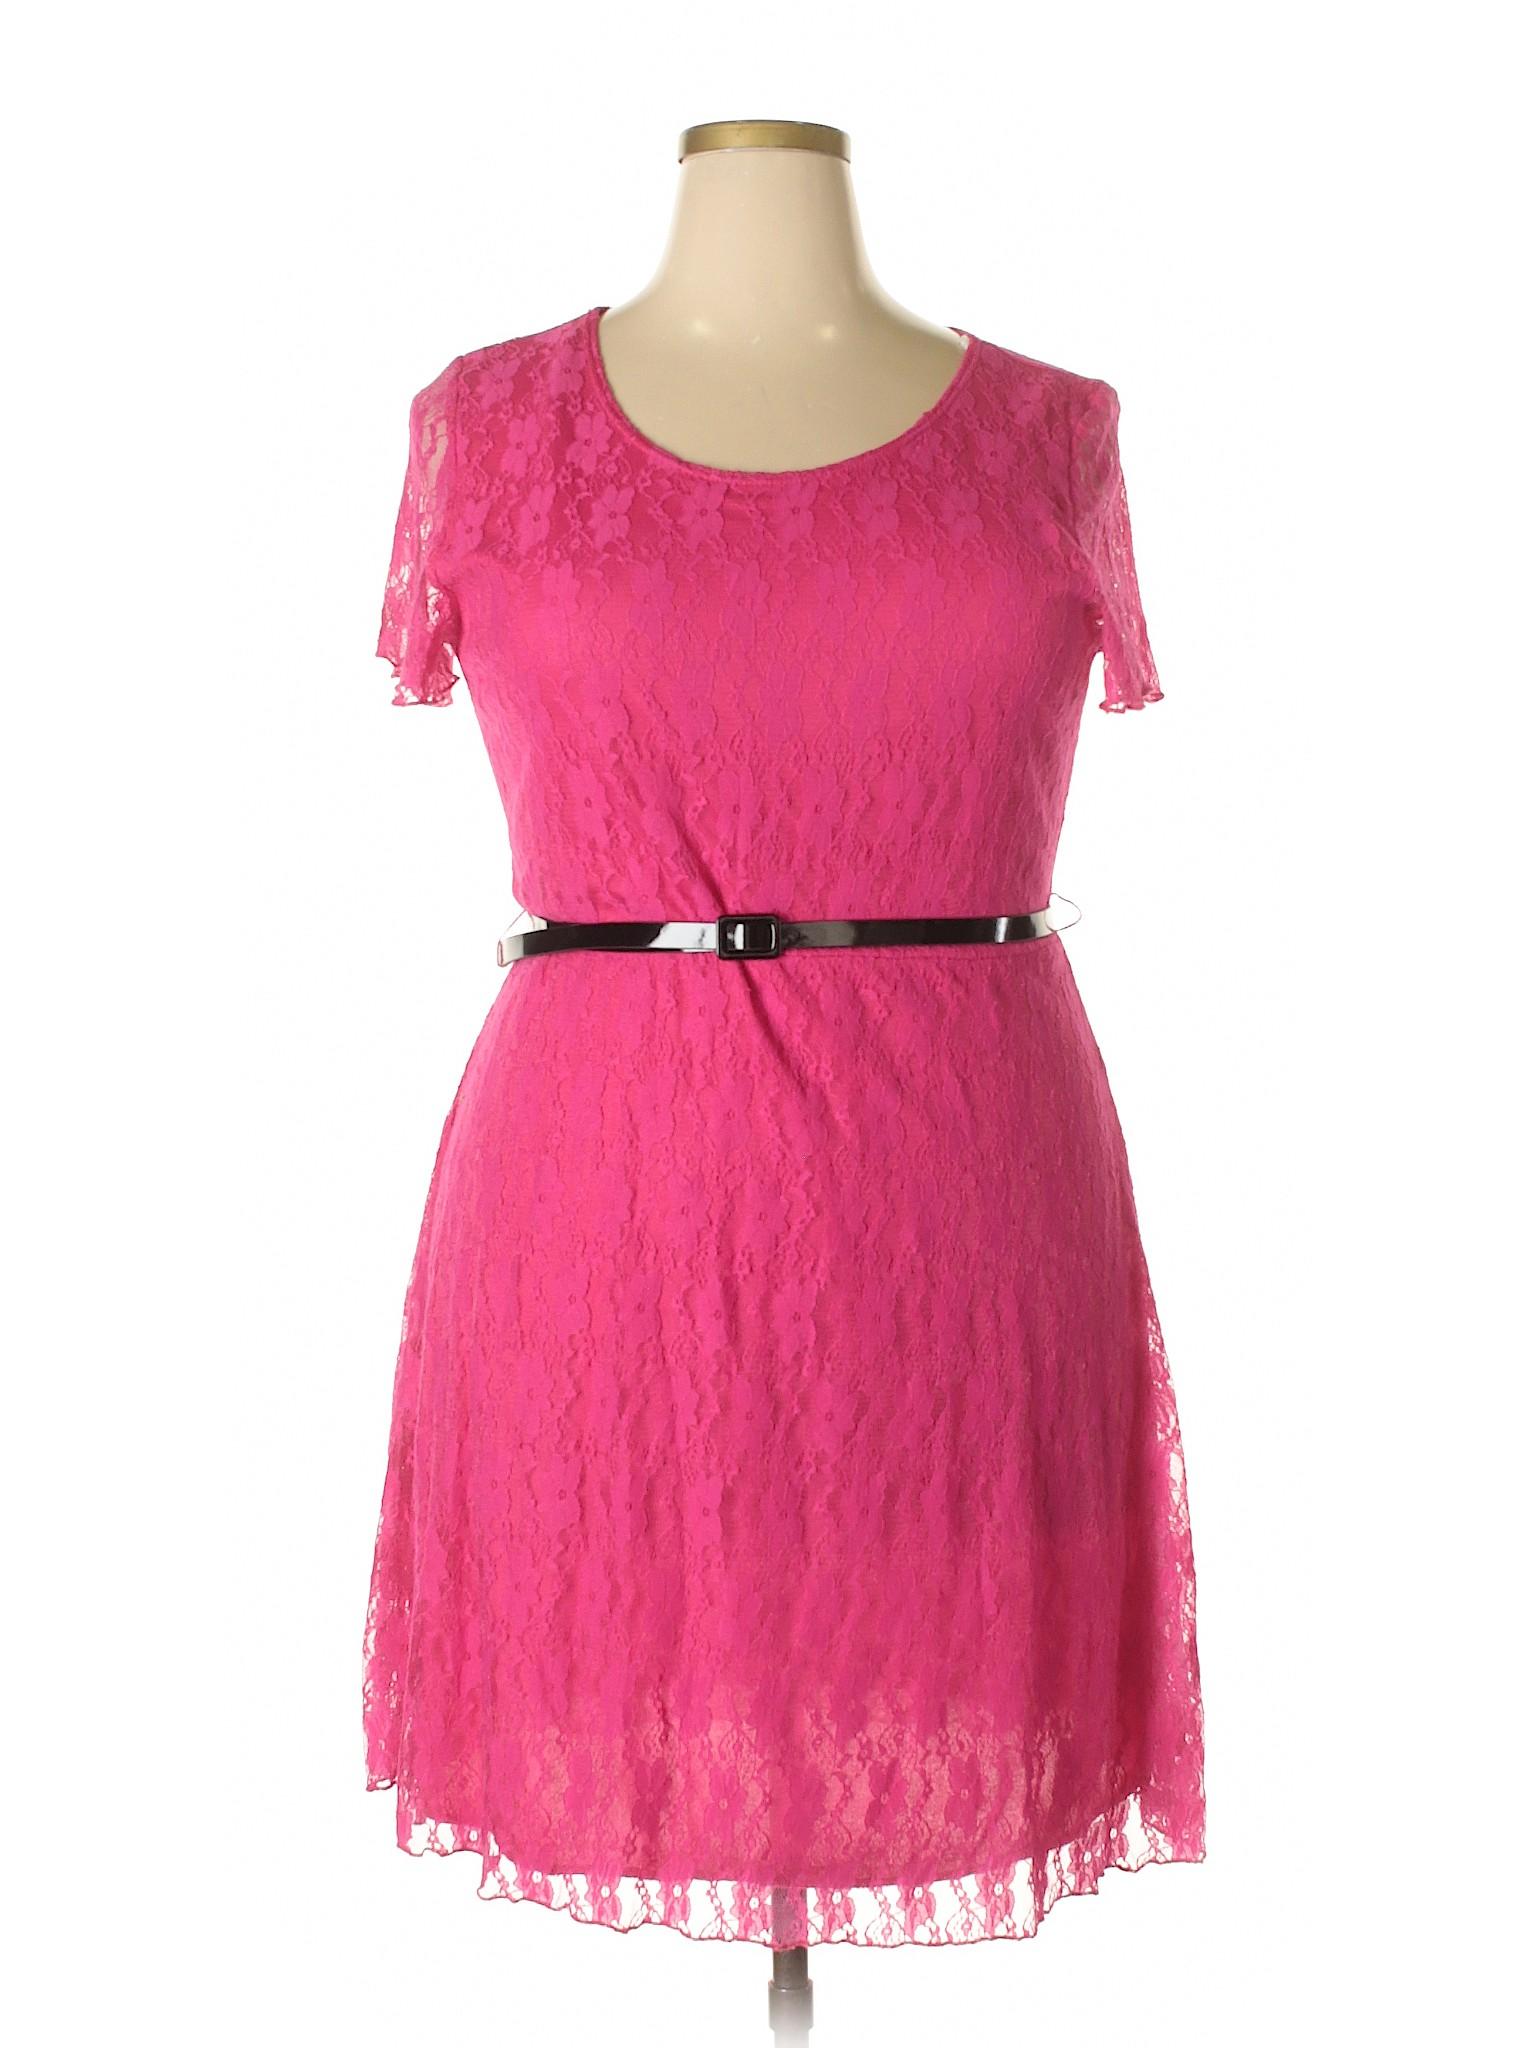 Star winter Vixen Casual Dress Boutique HFTnqxwH